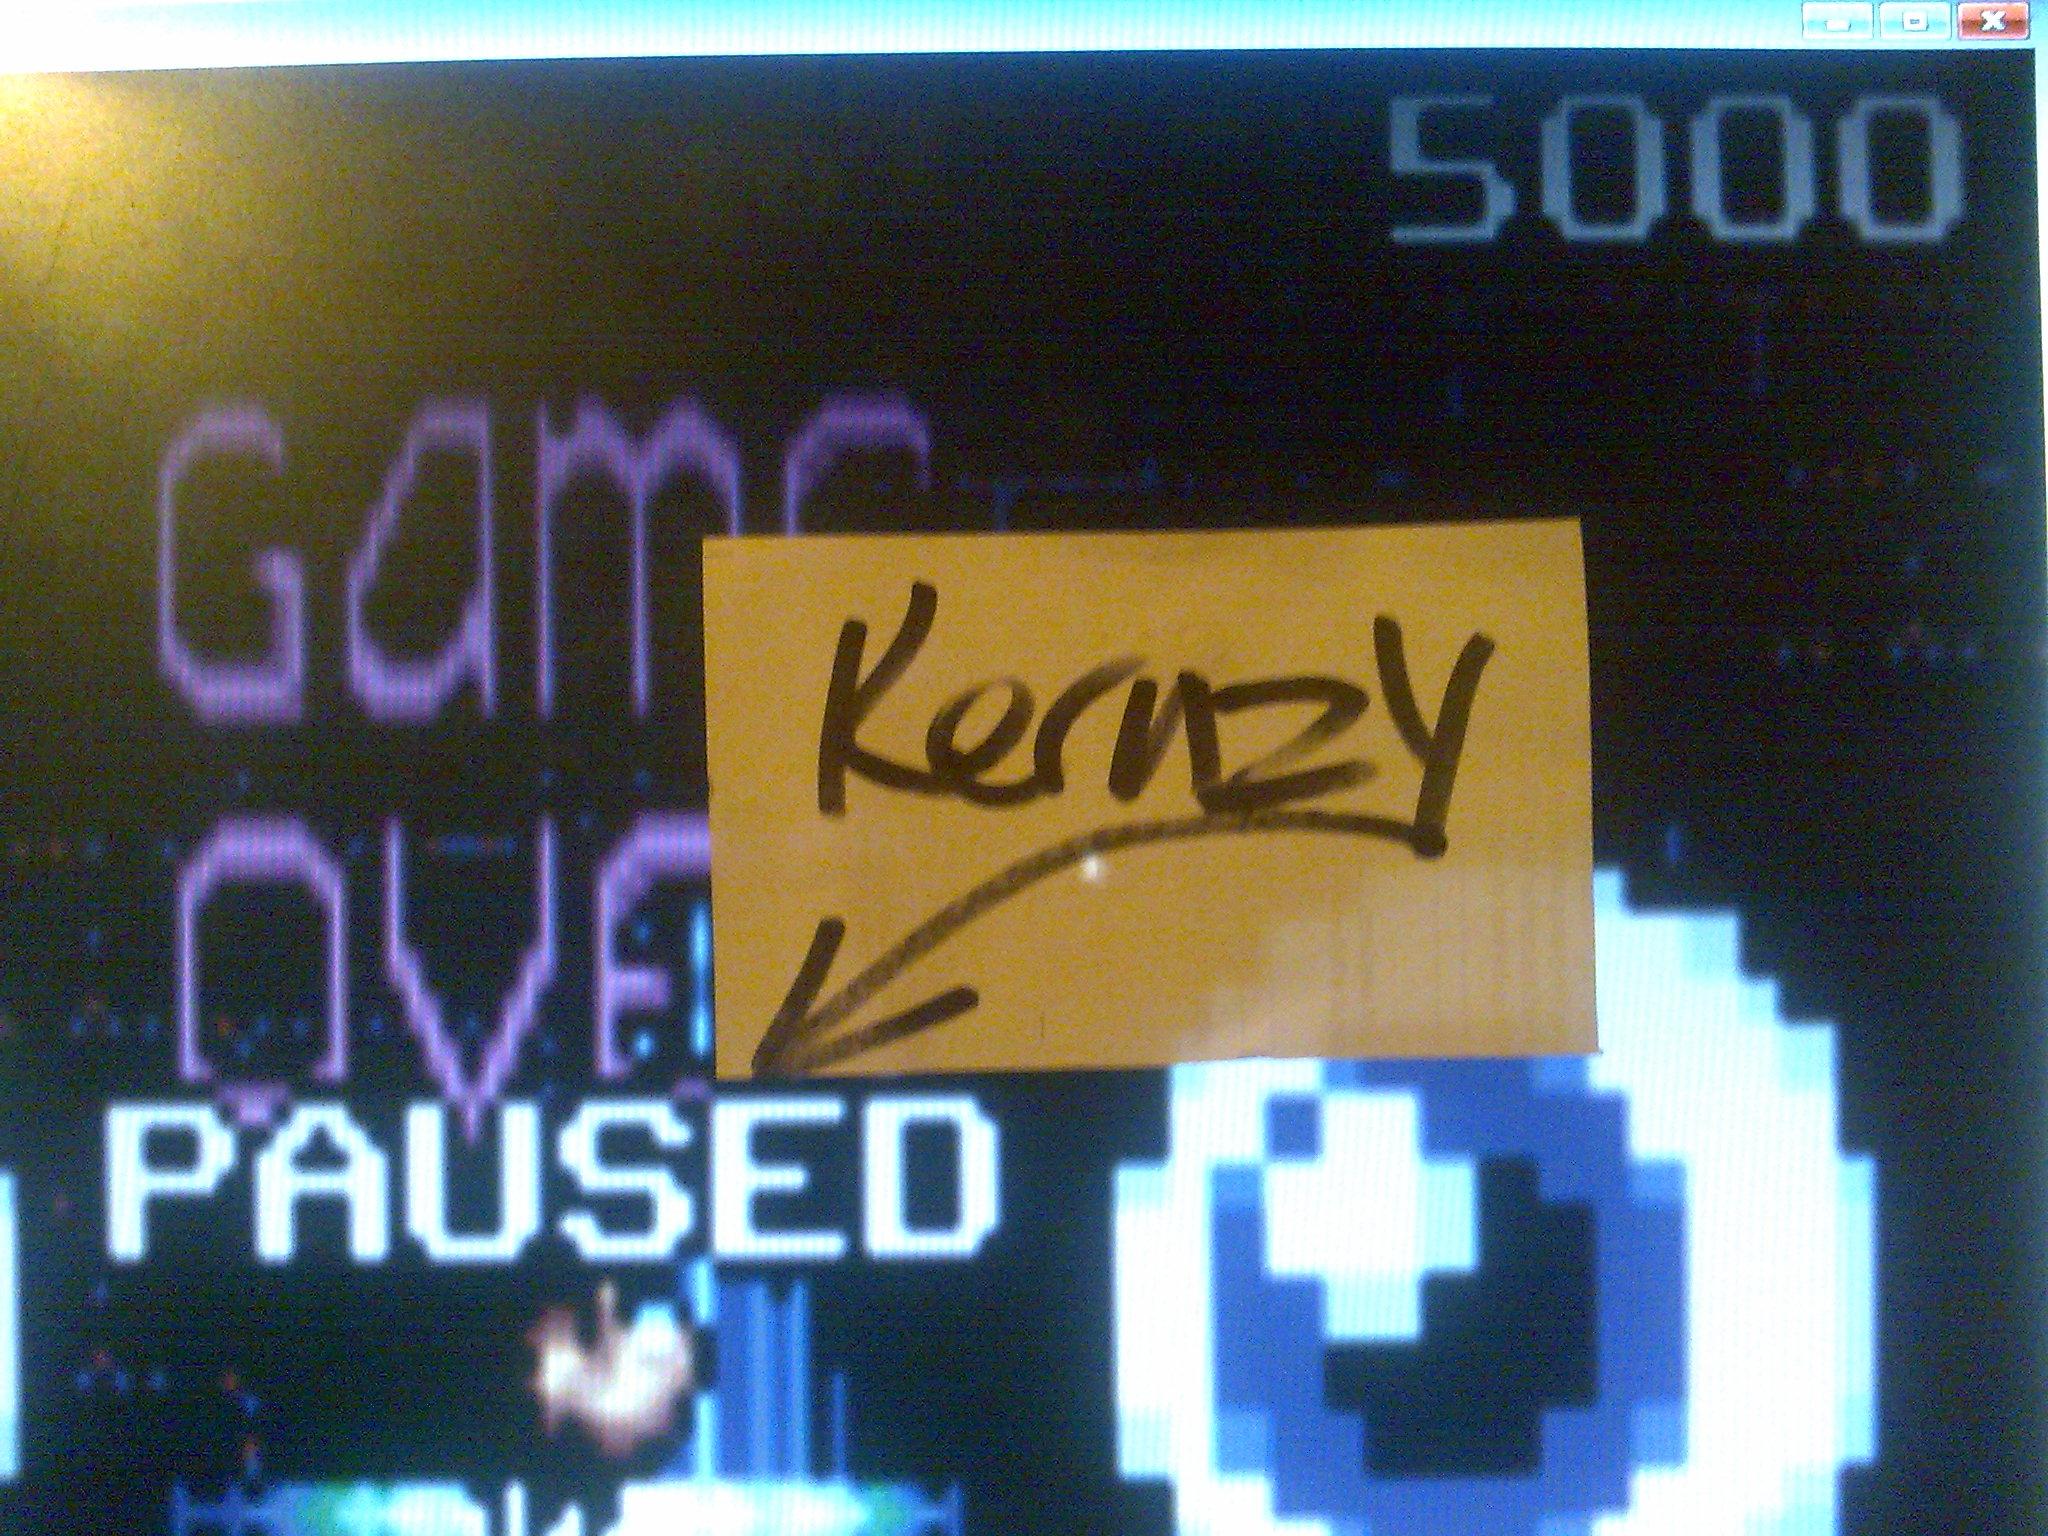 kernzy: Fat Bobby (Atari Lynx Emulated) 5,000 points on 2014-10-16 21:09:31